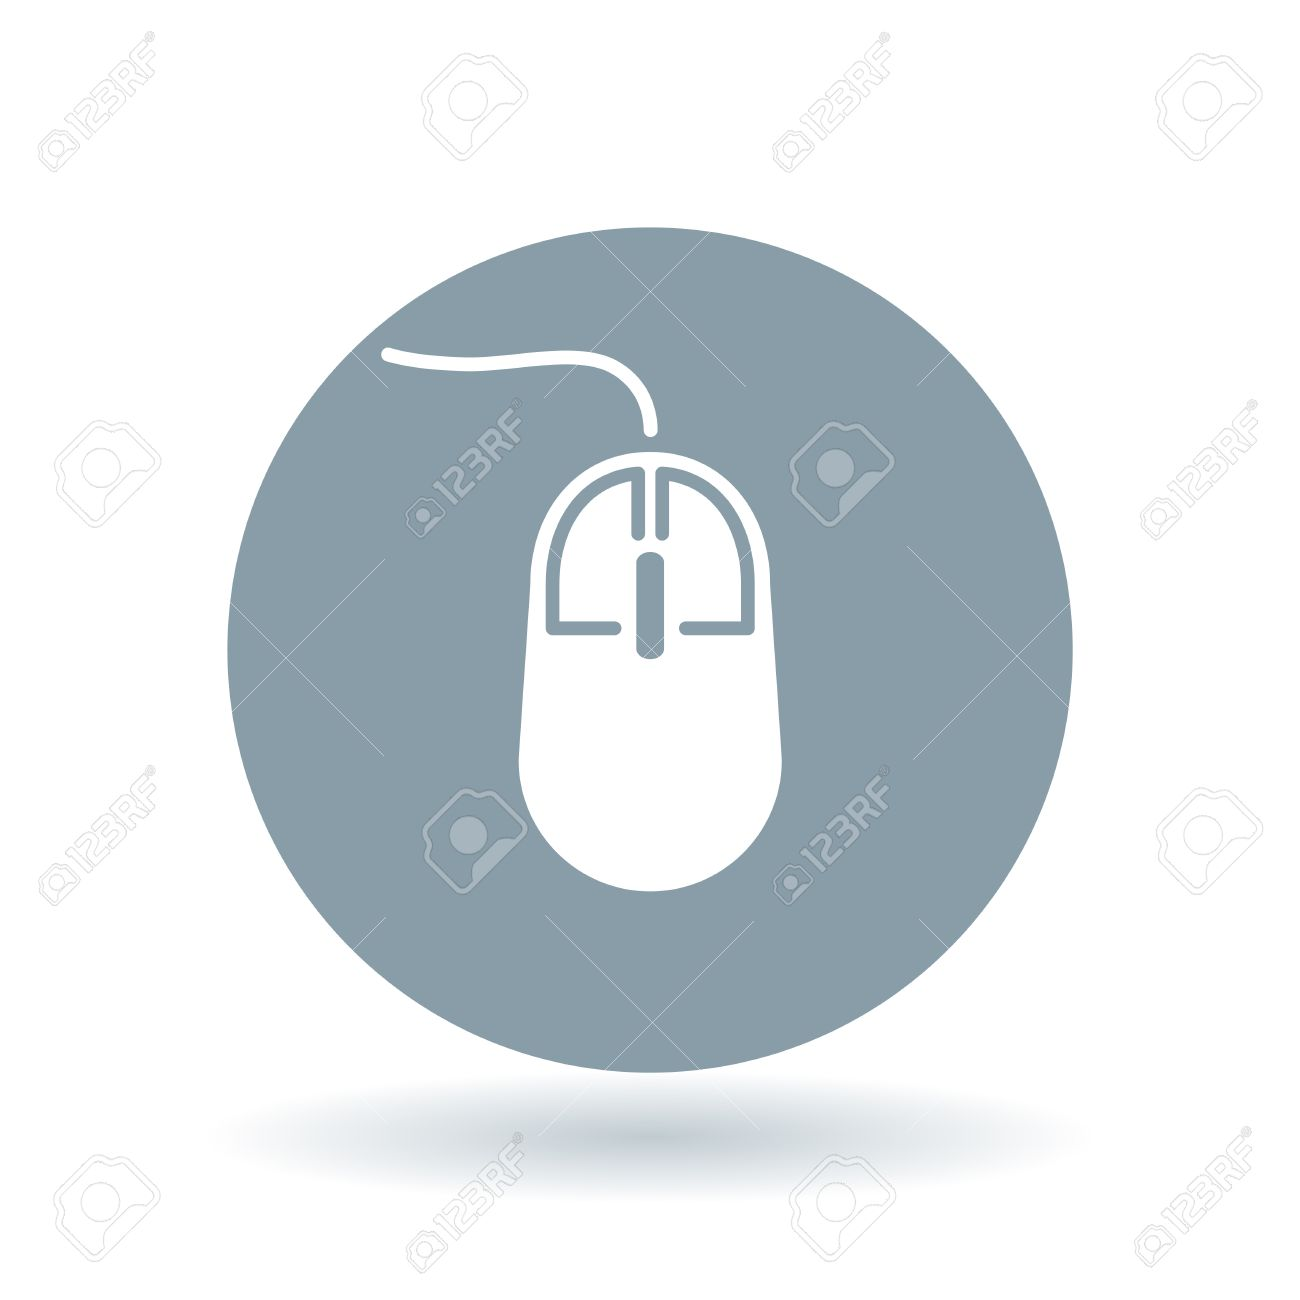 Amusing Wired Communication Symbol Images - Diagram symbol ...